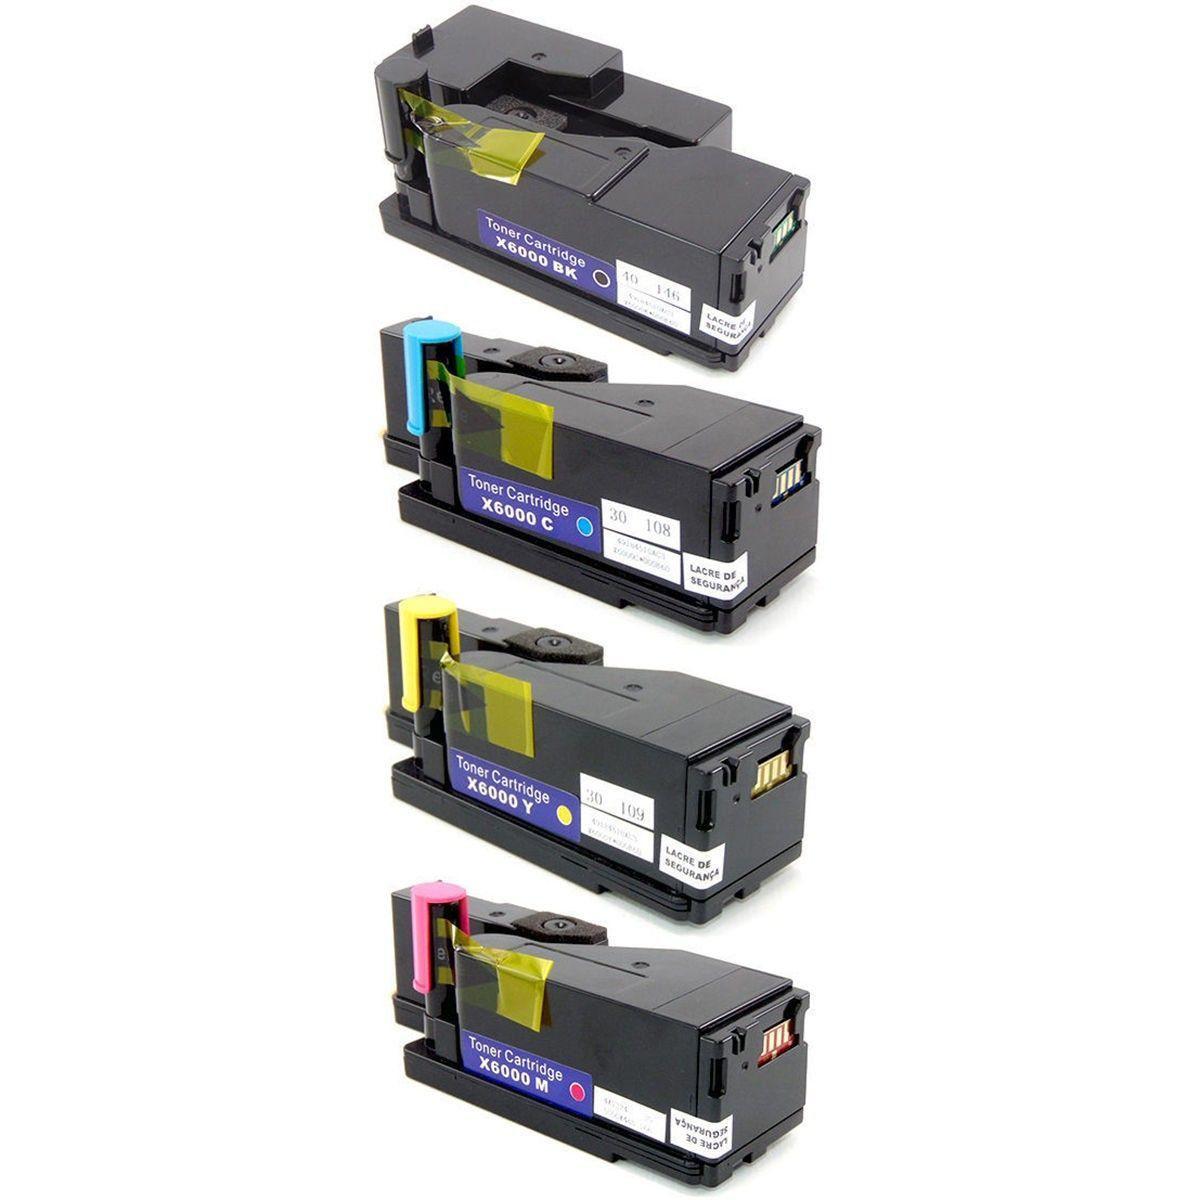 Compatível: Kit Colorido de Toner 106R01634 106R01631 106R01633 106R01632 para Xerox 6000 6010 6015 6015b 6015ni